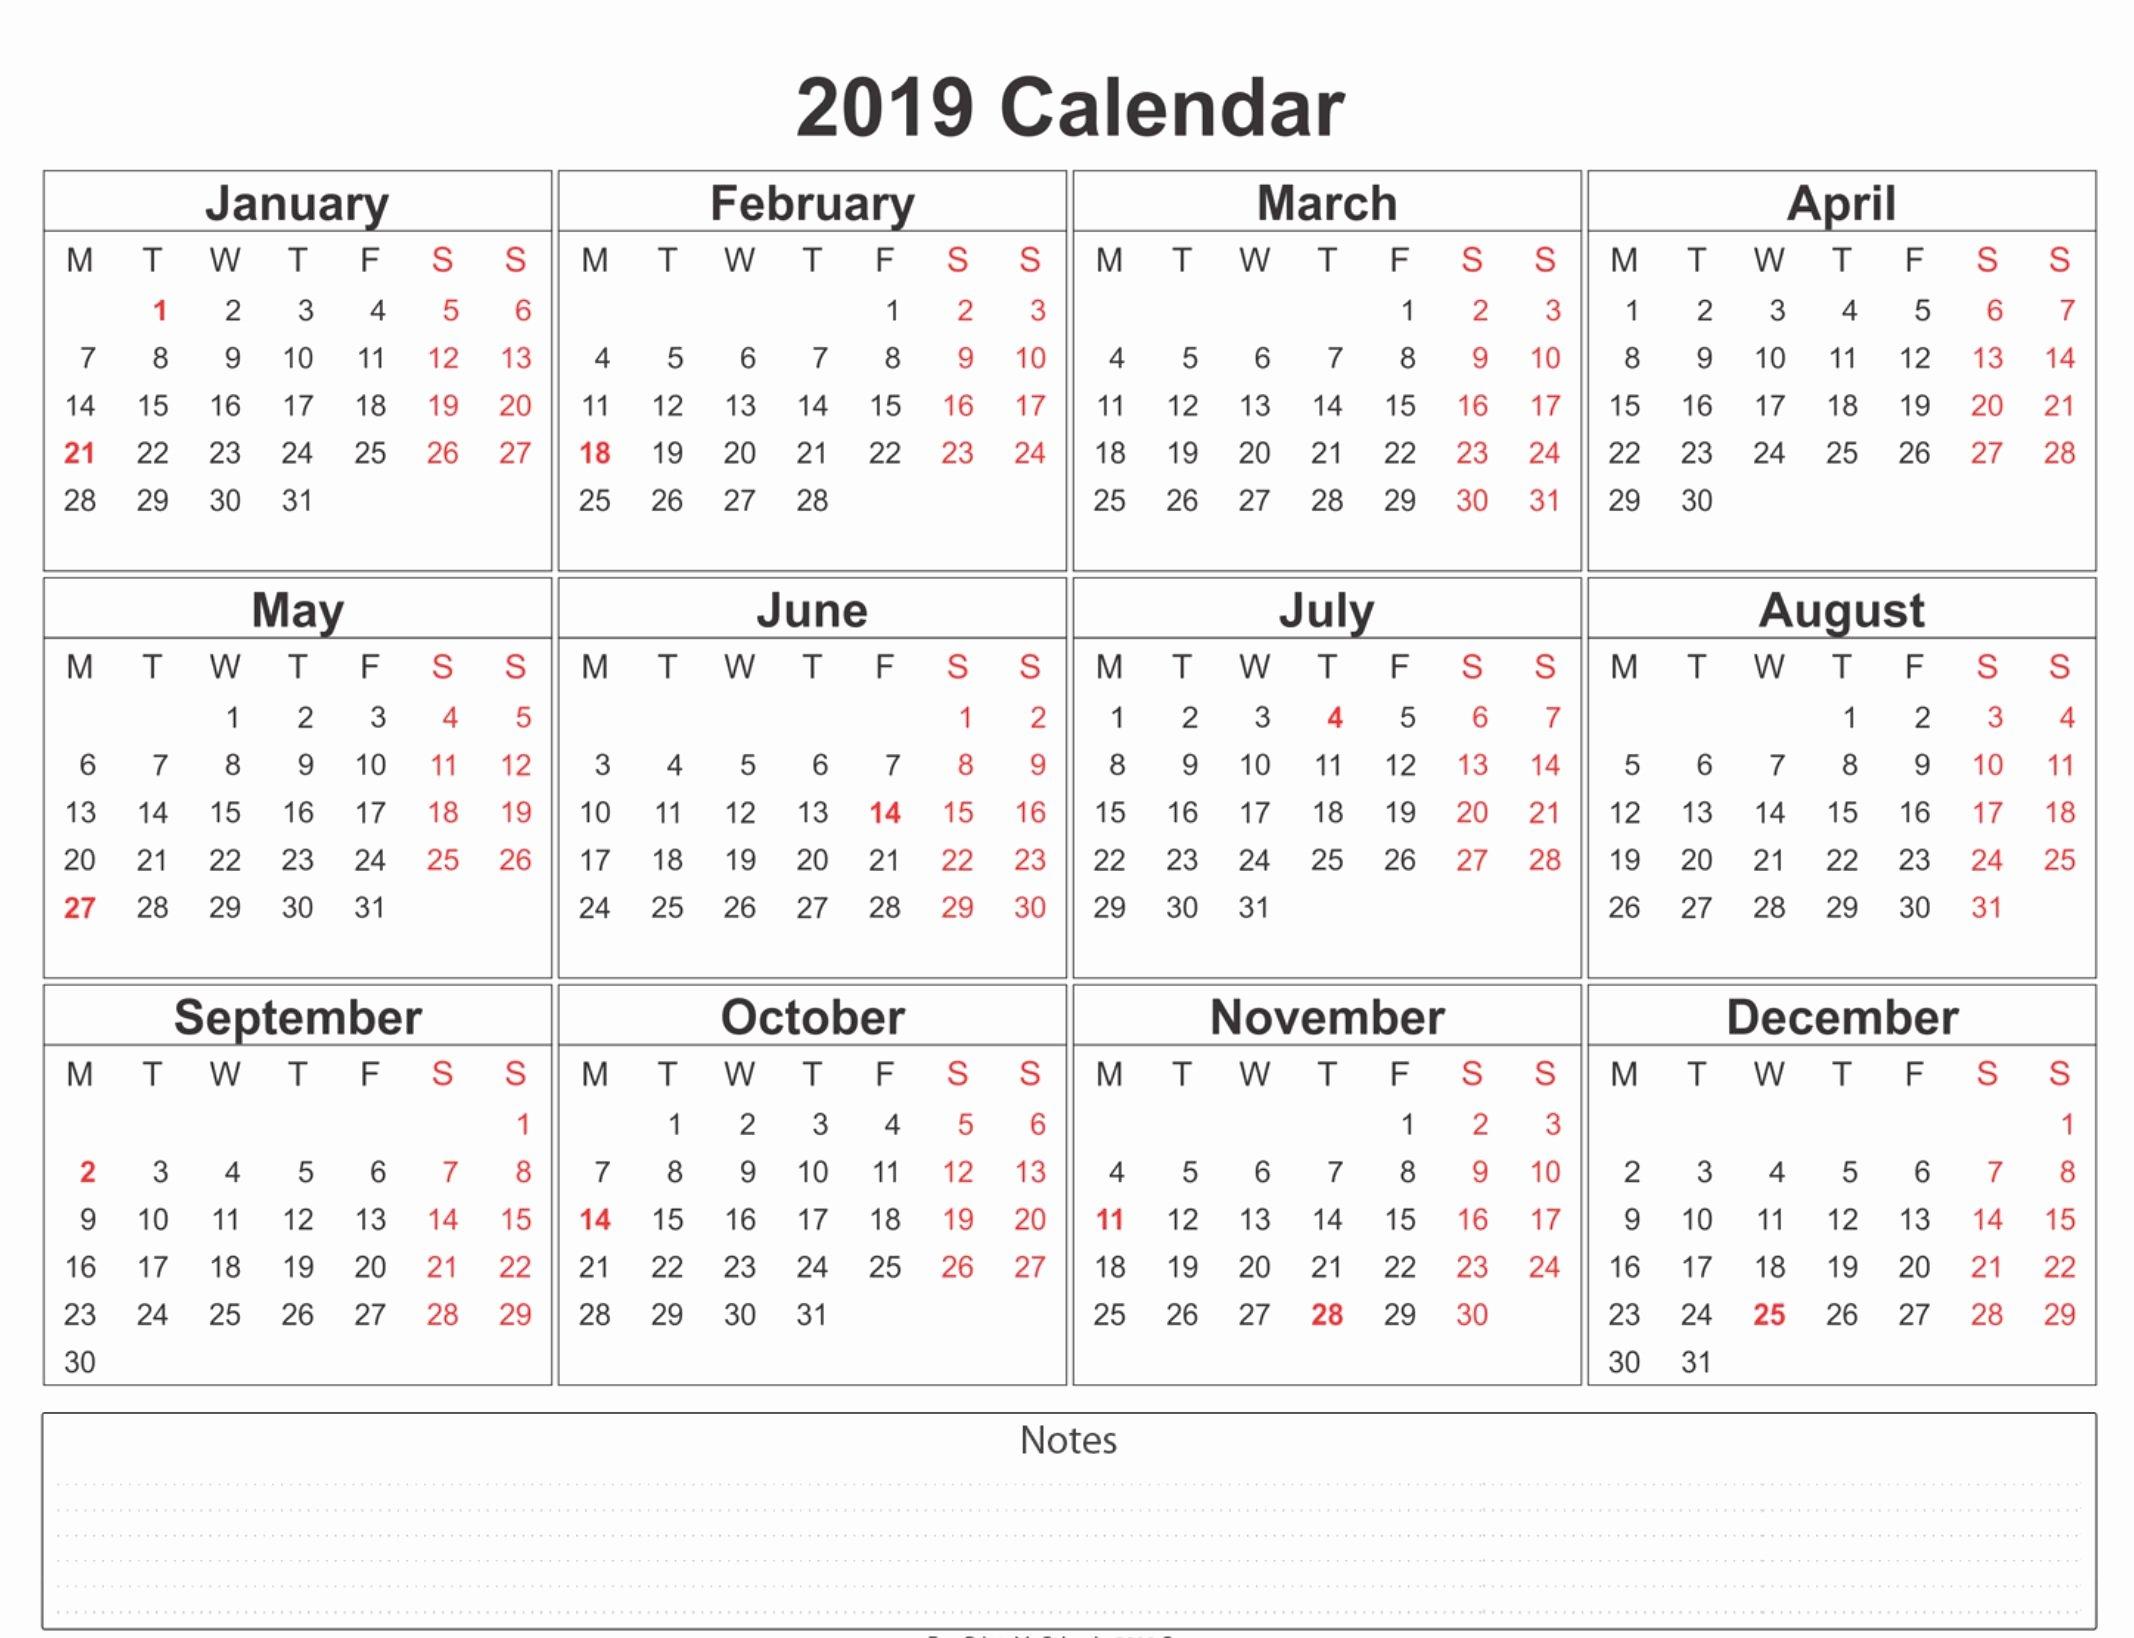 Free 2019 Calendar Template Elegant 2019 Calendar Printable Free A4 Template